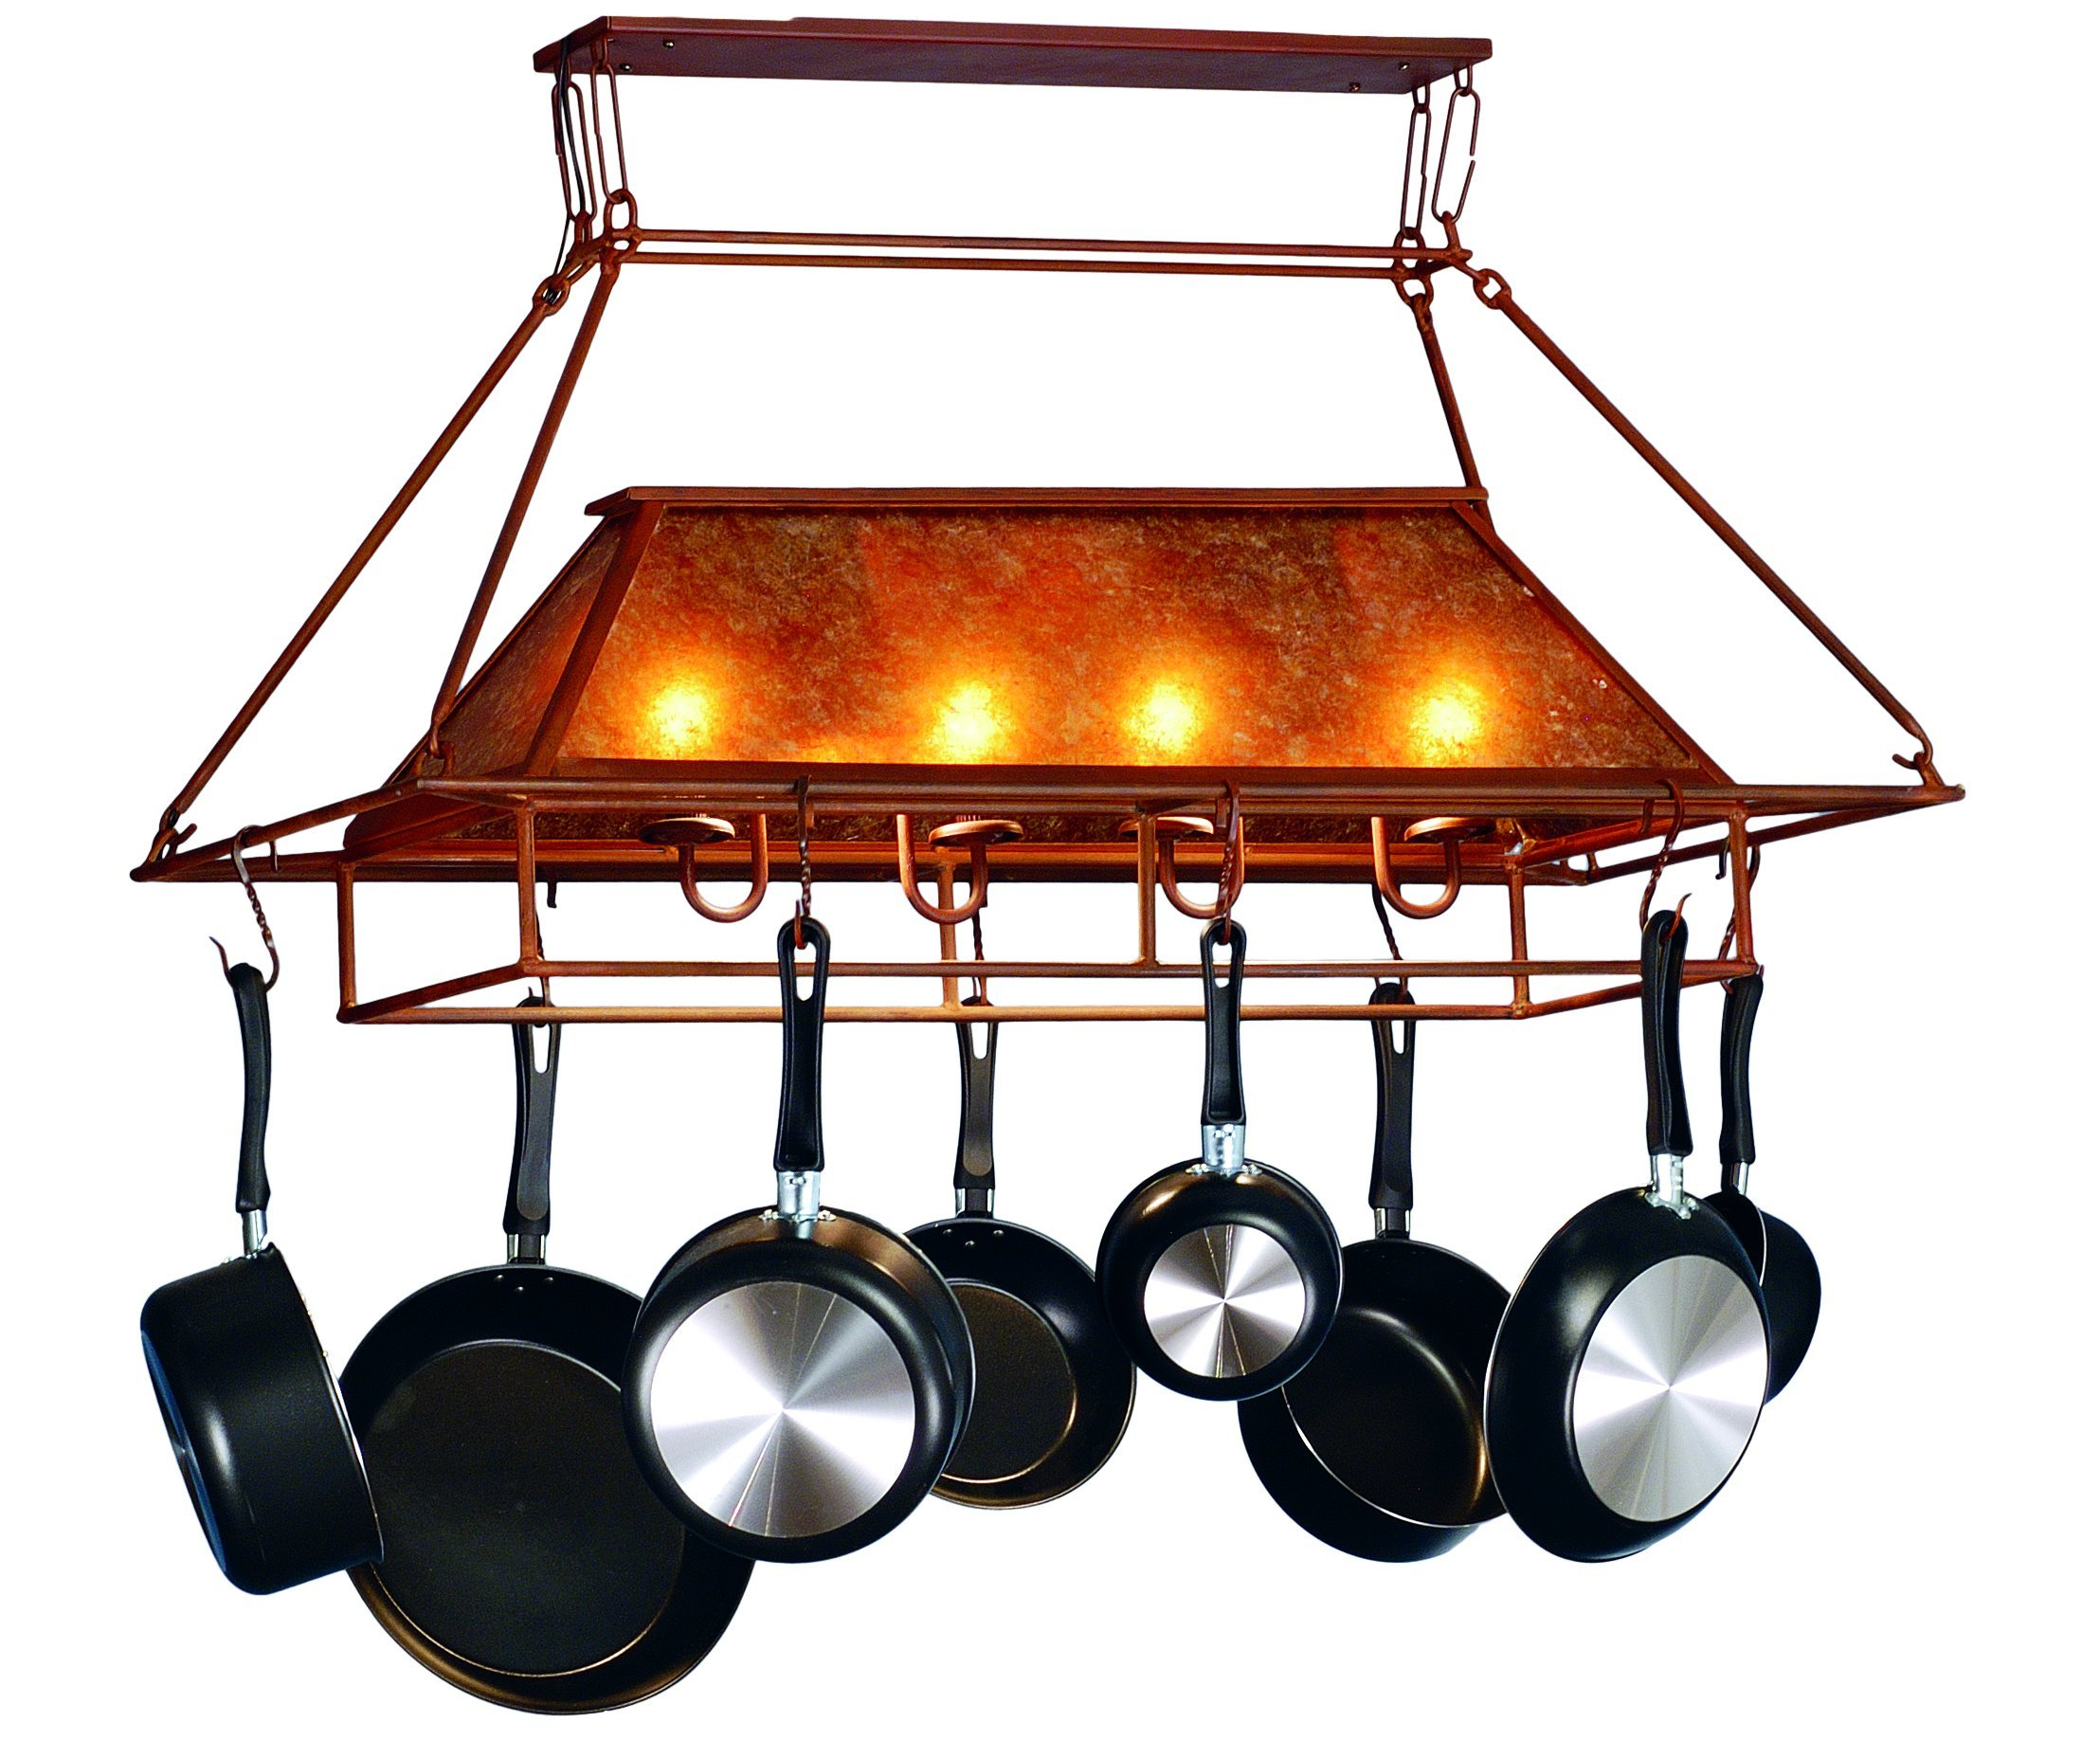 Meyda Tiffany Custom Lighting 77830 Simple Mission 2-Light Pot Rack, Rust Finish with Amber Mica Panels